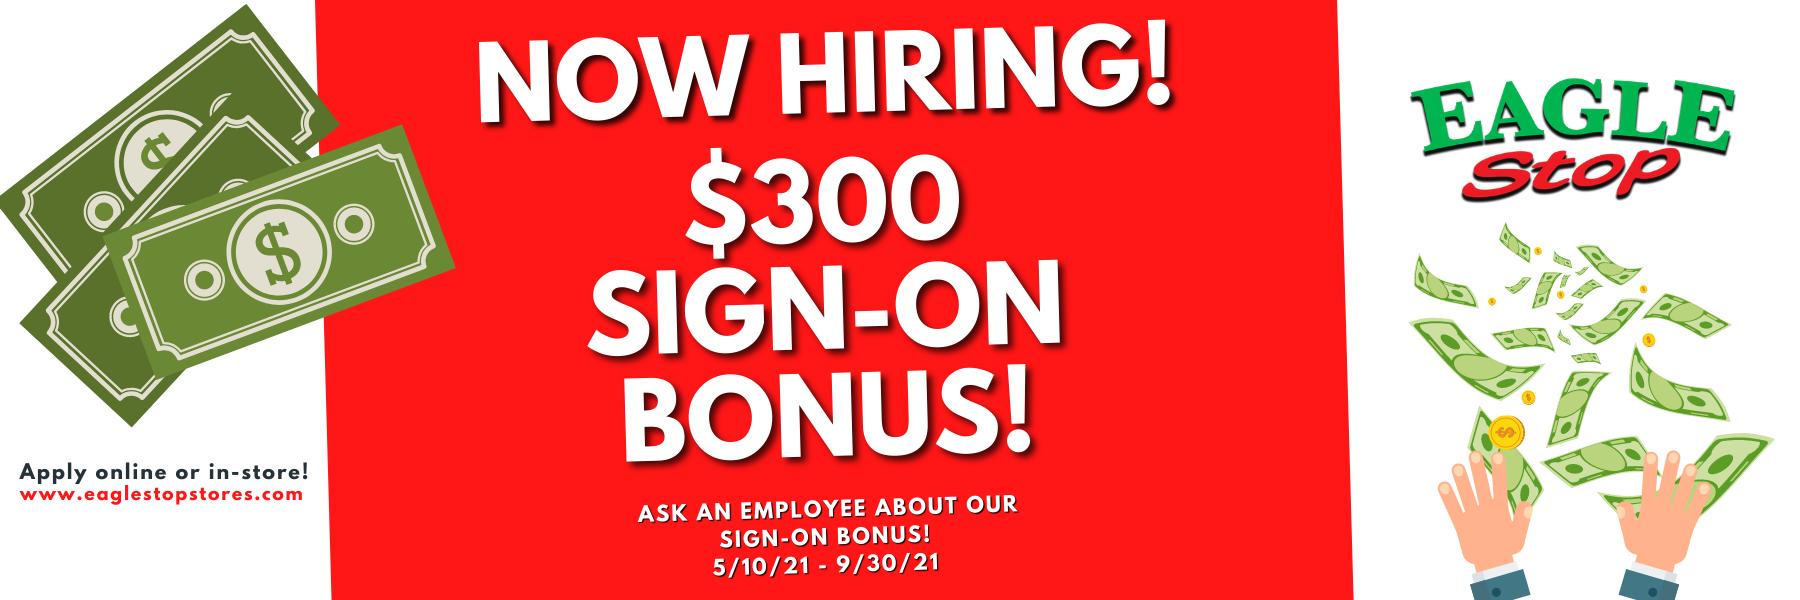 Copy of Sign-On Bonus